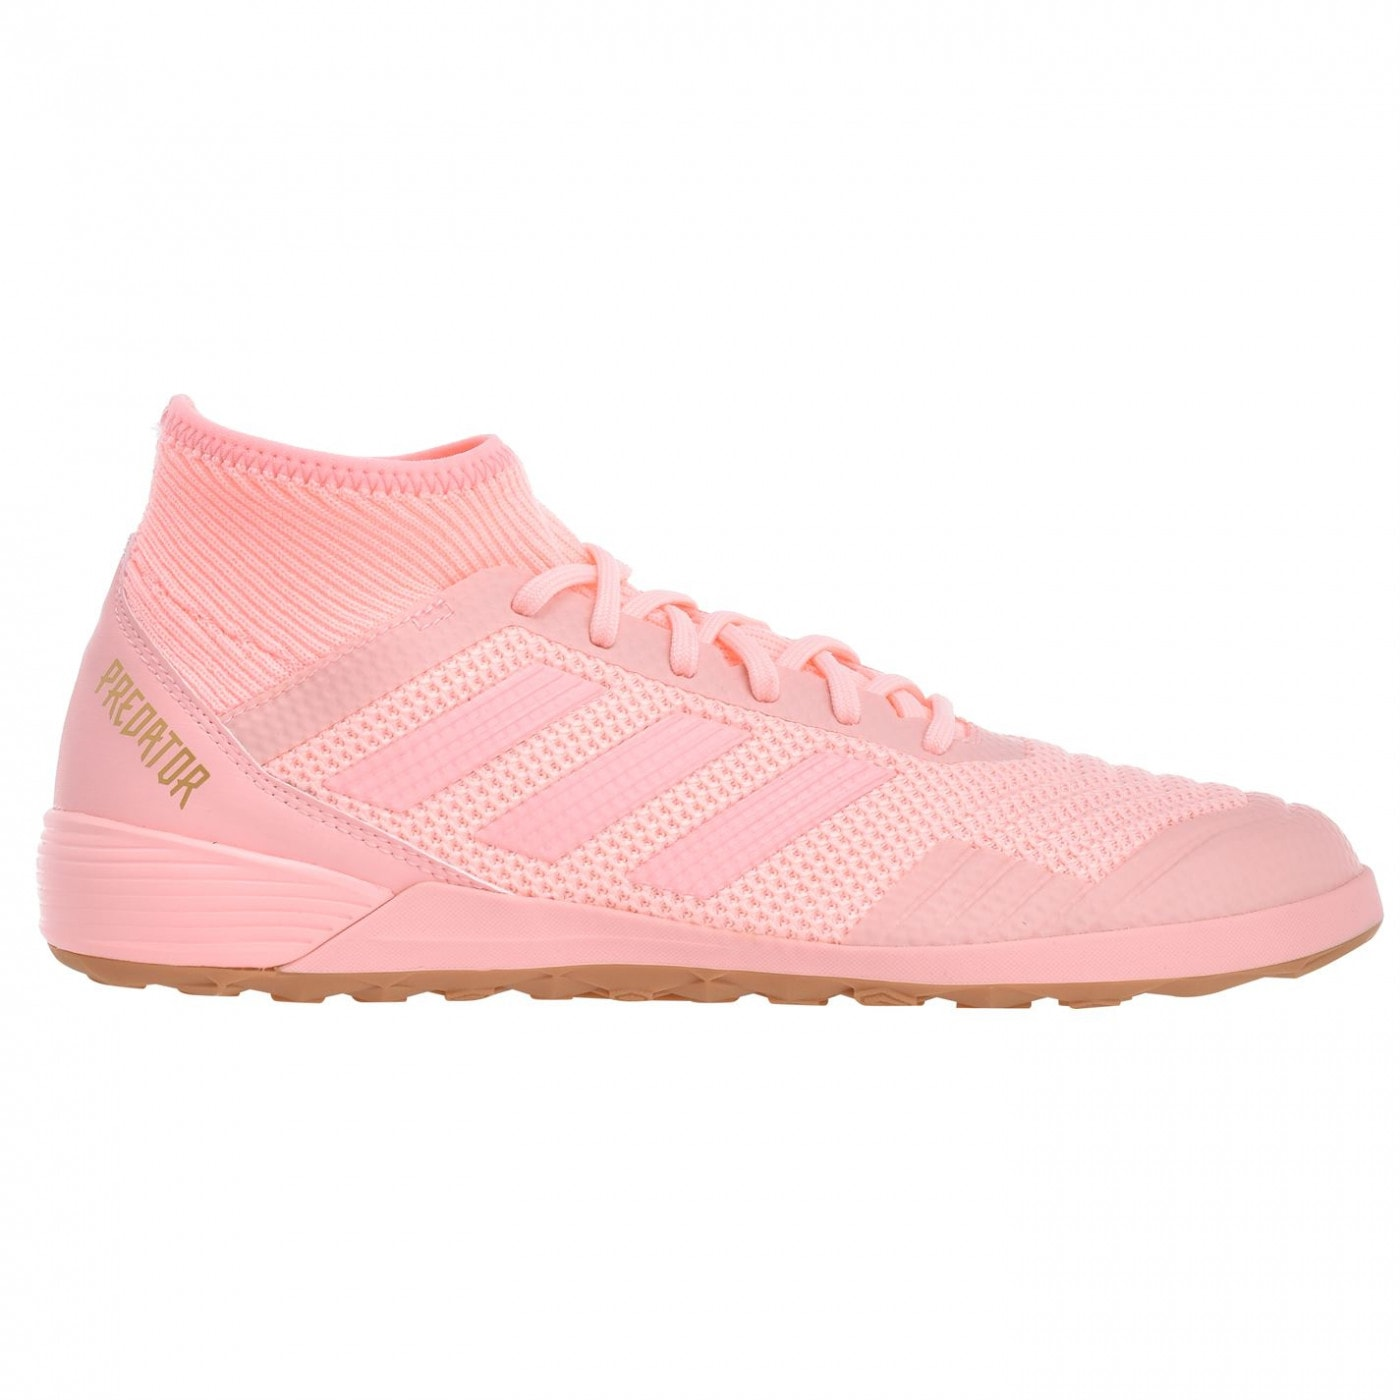 Adidas Predator Tango 18.3 Men's Futsal Boots